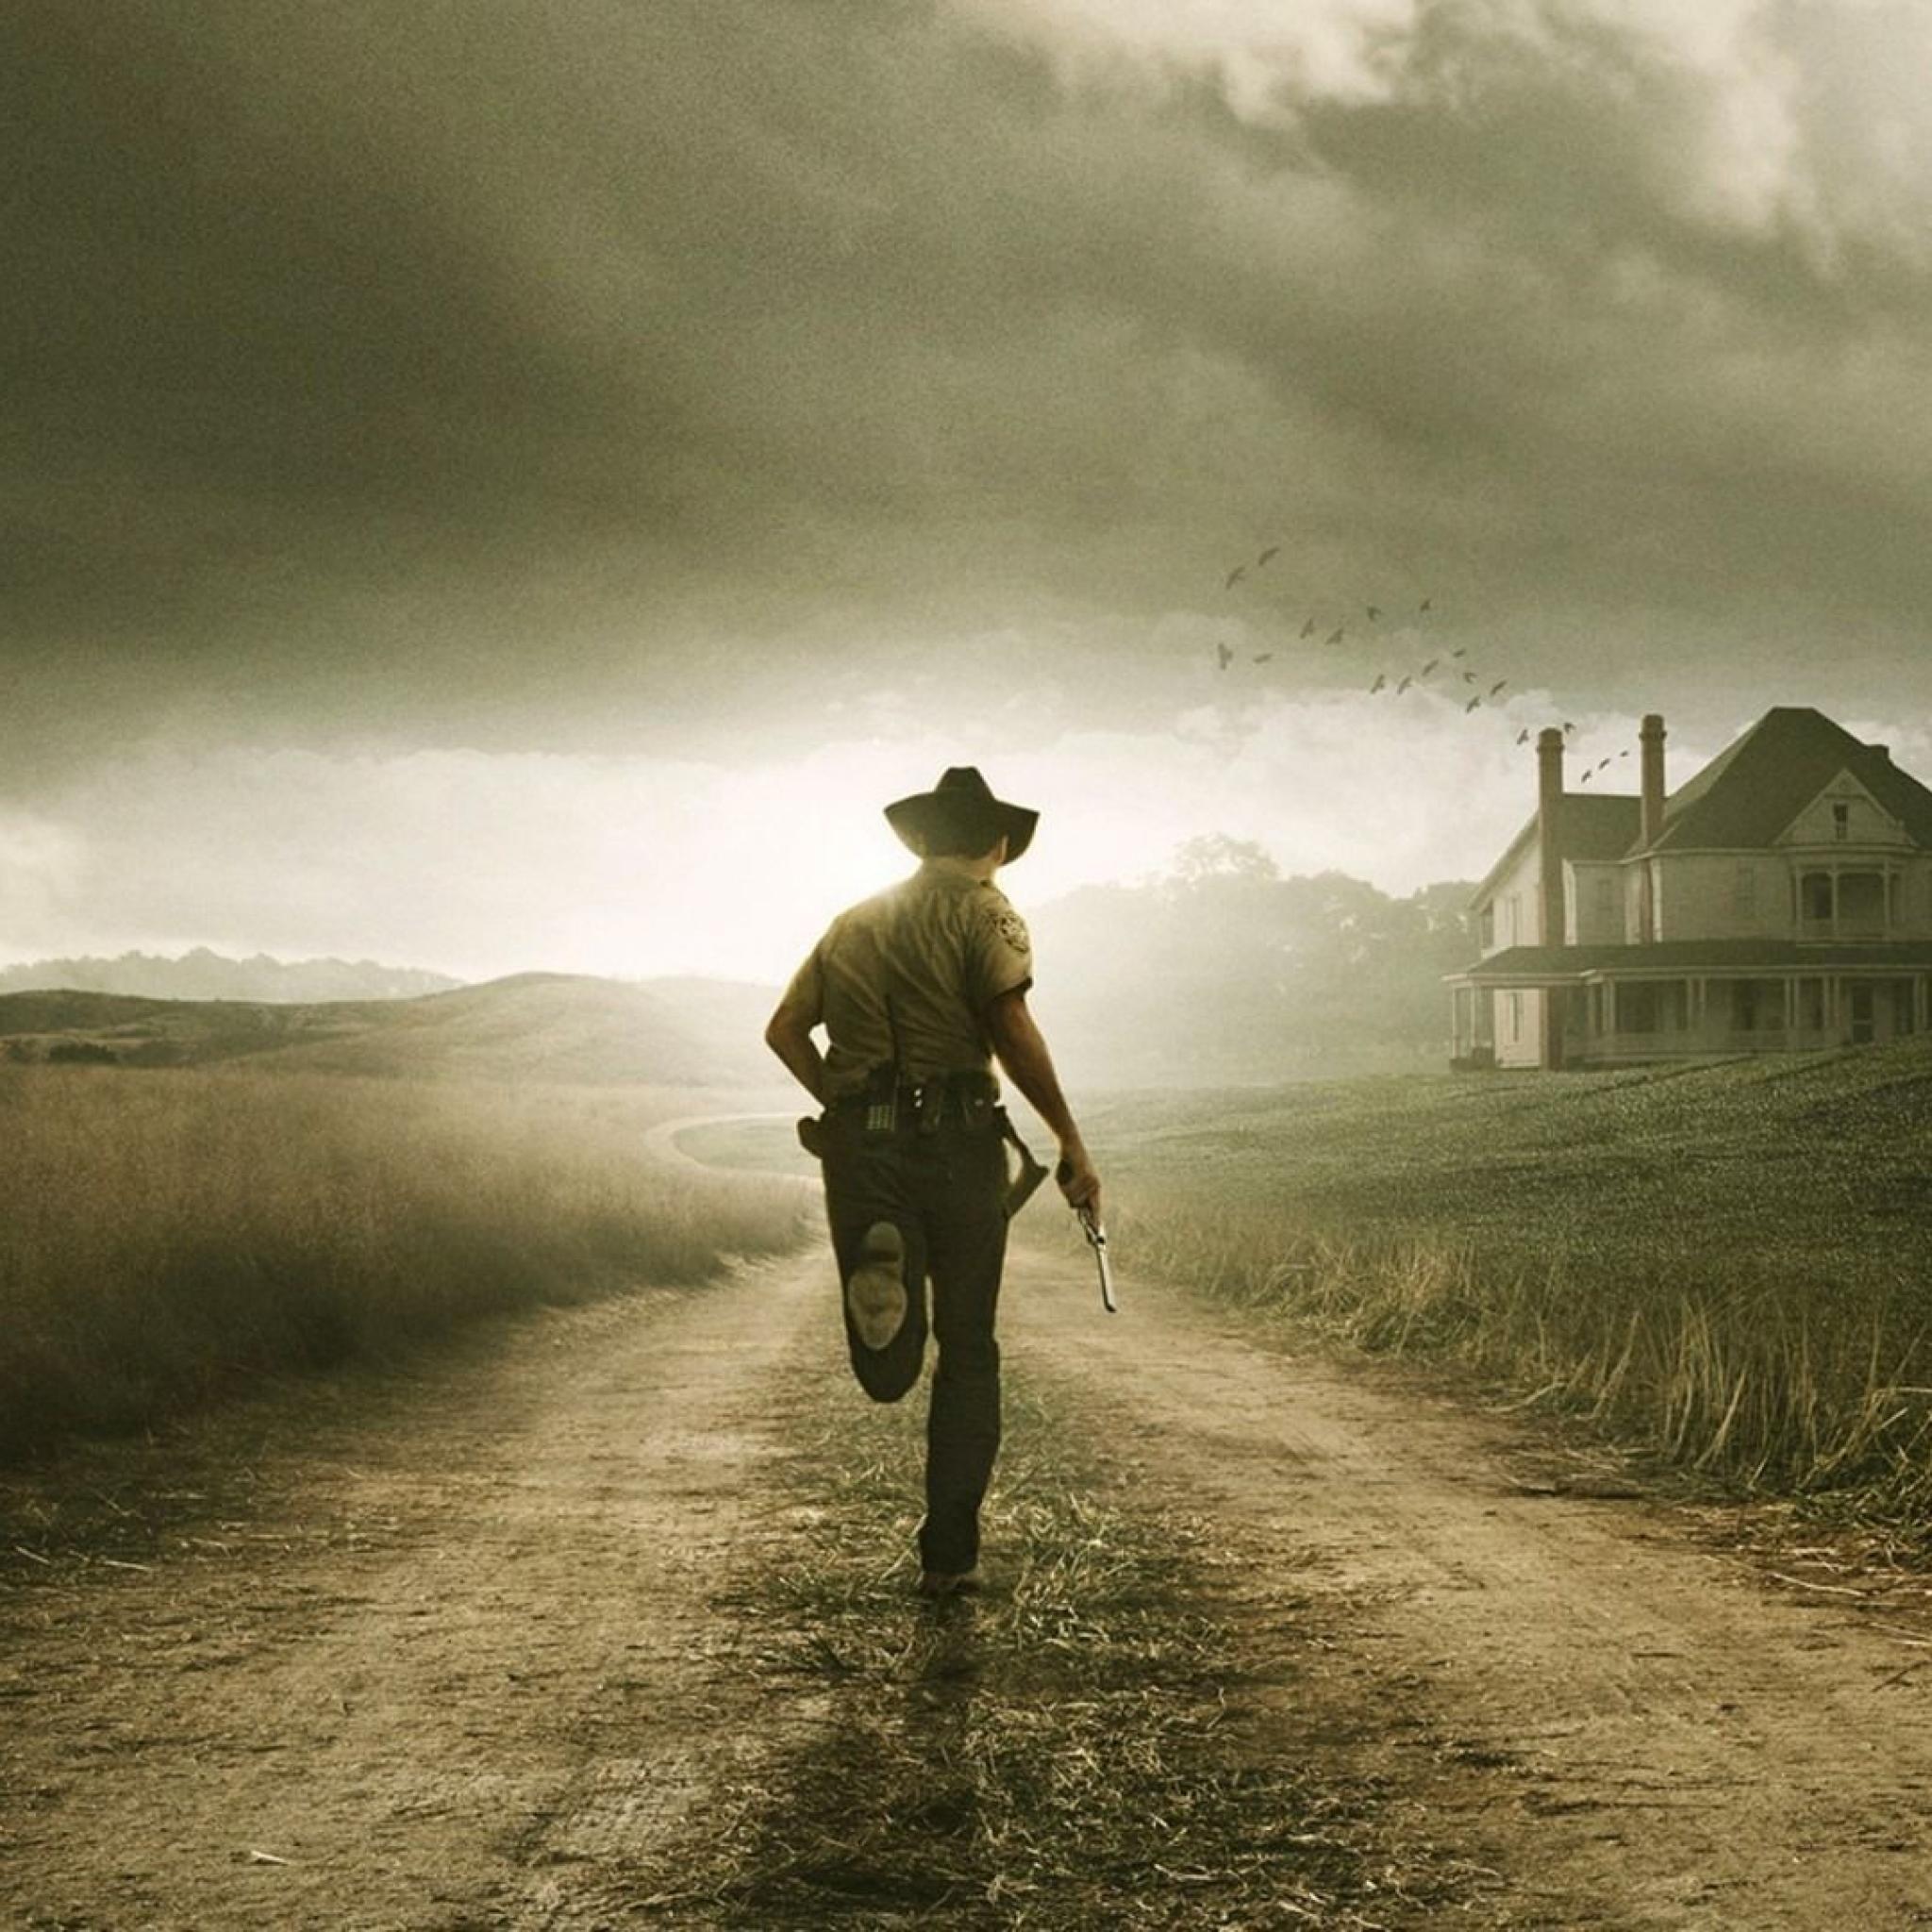 Download The Walking Dead iPad Wallpaper HD